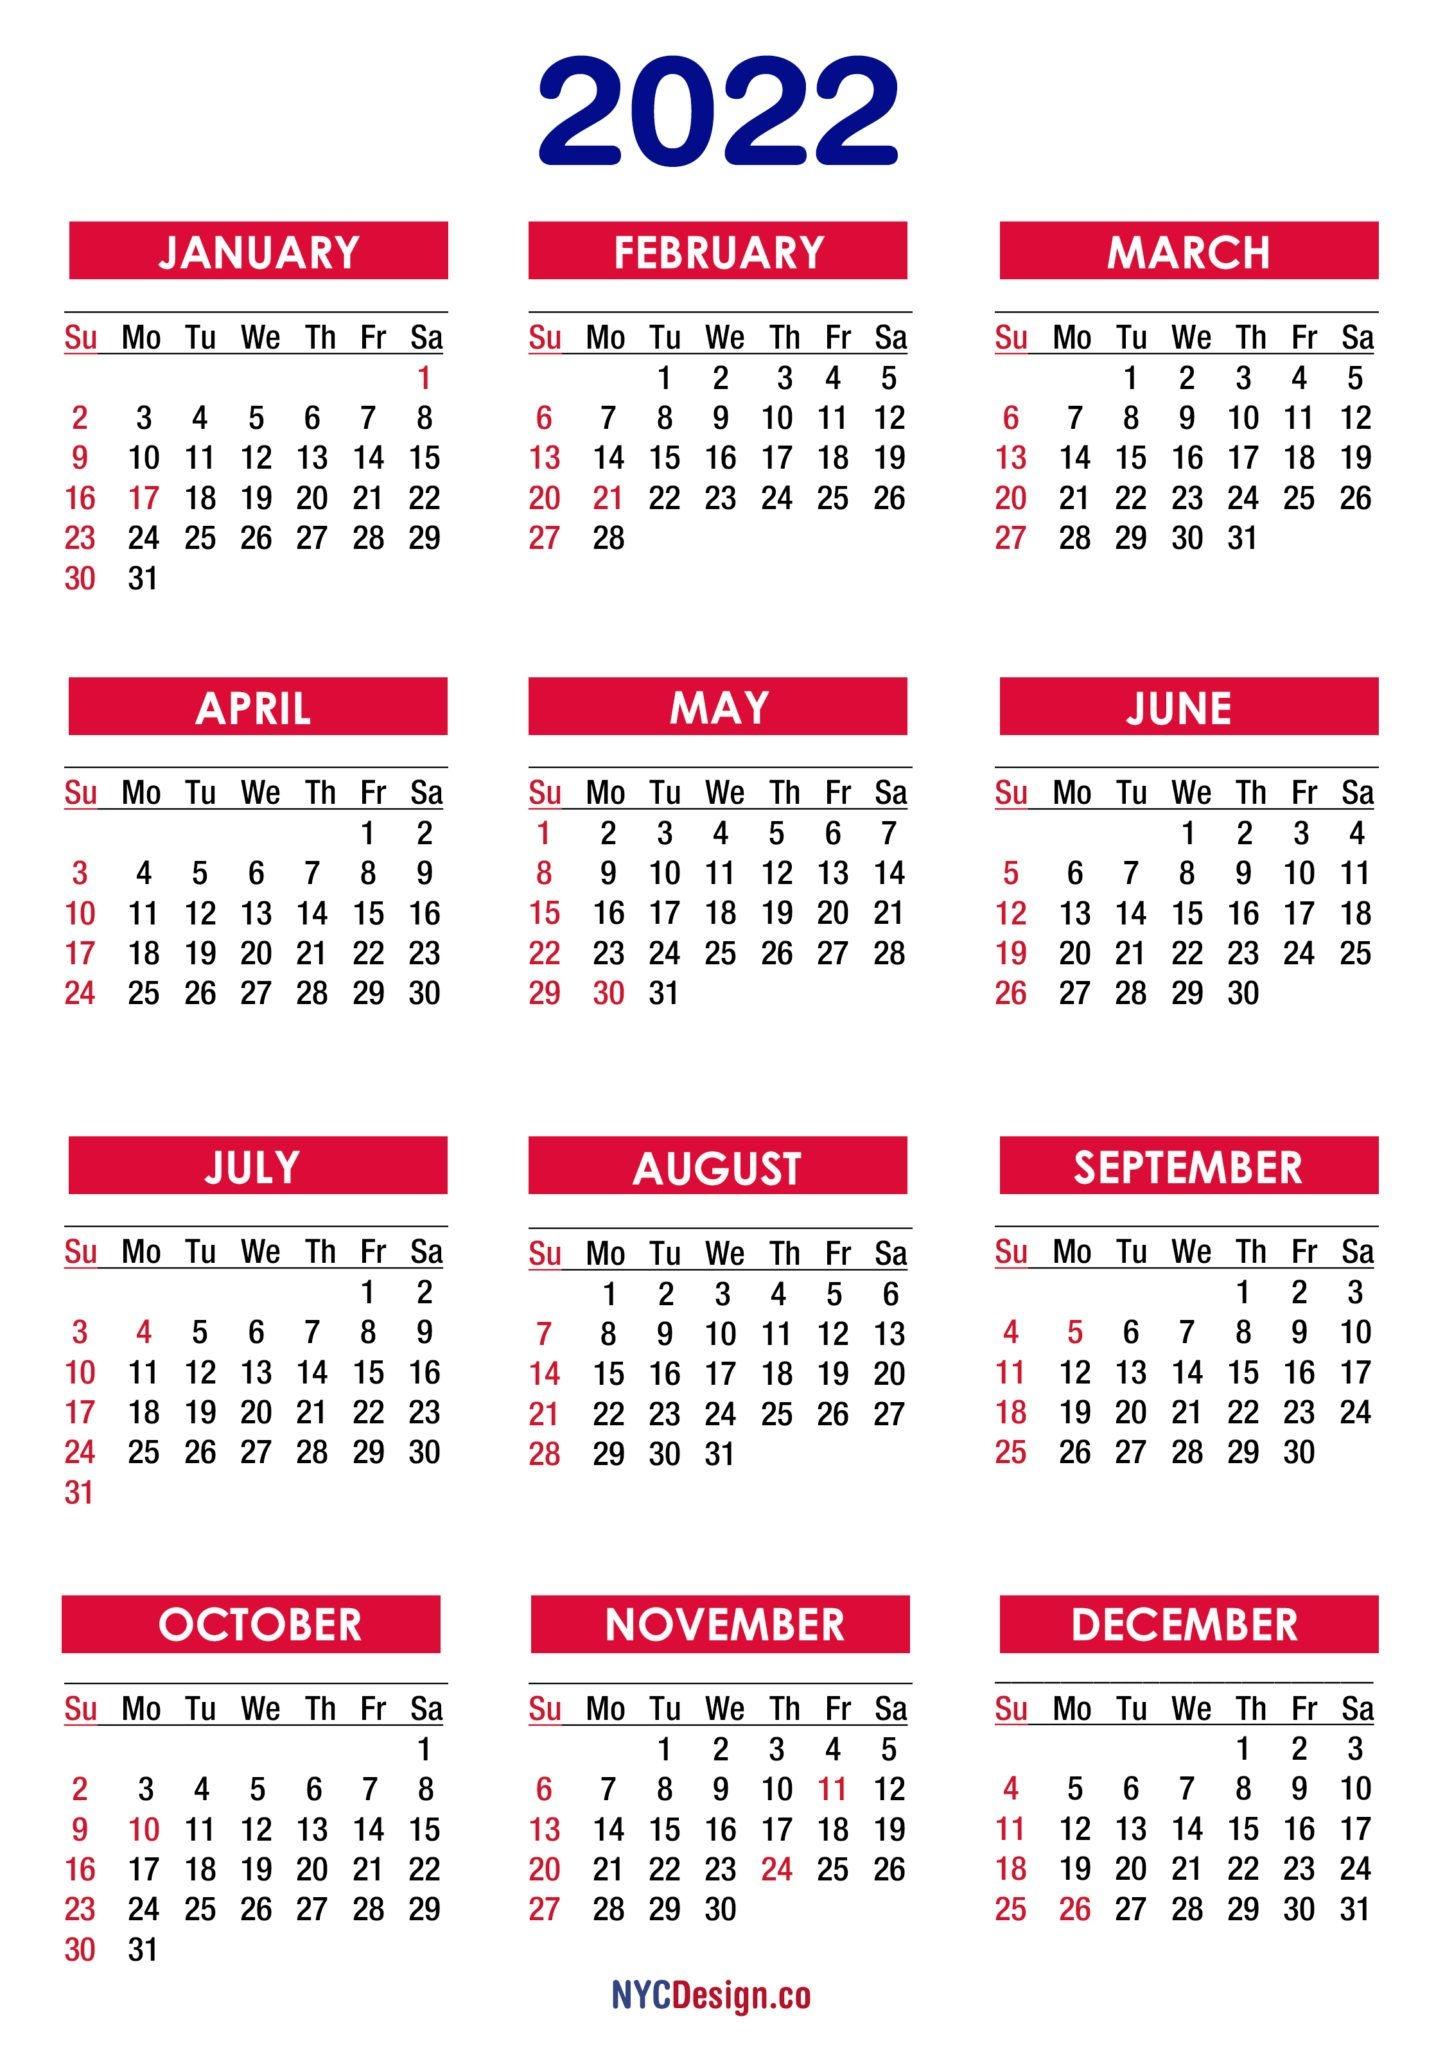 2022 Calendar With Holidays, Printable Free, Pdf, Colorful